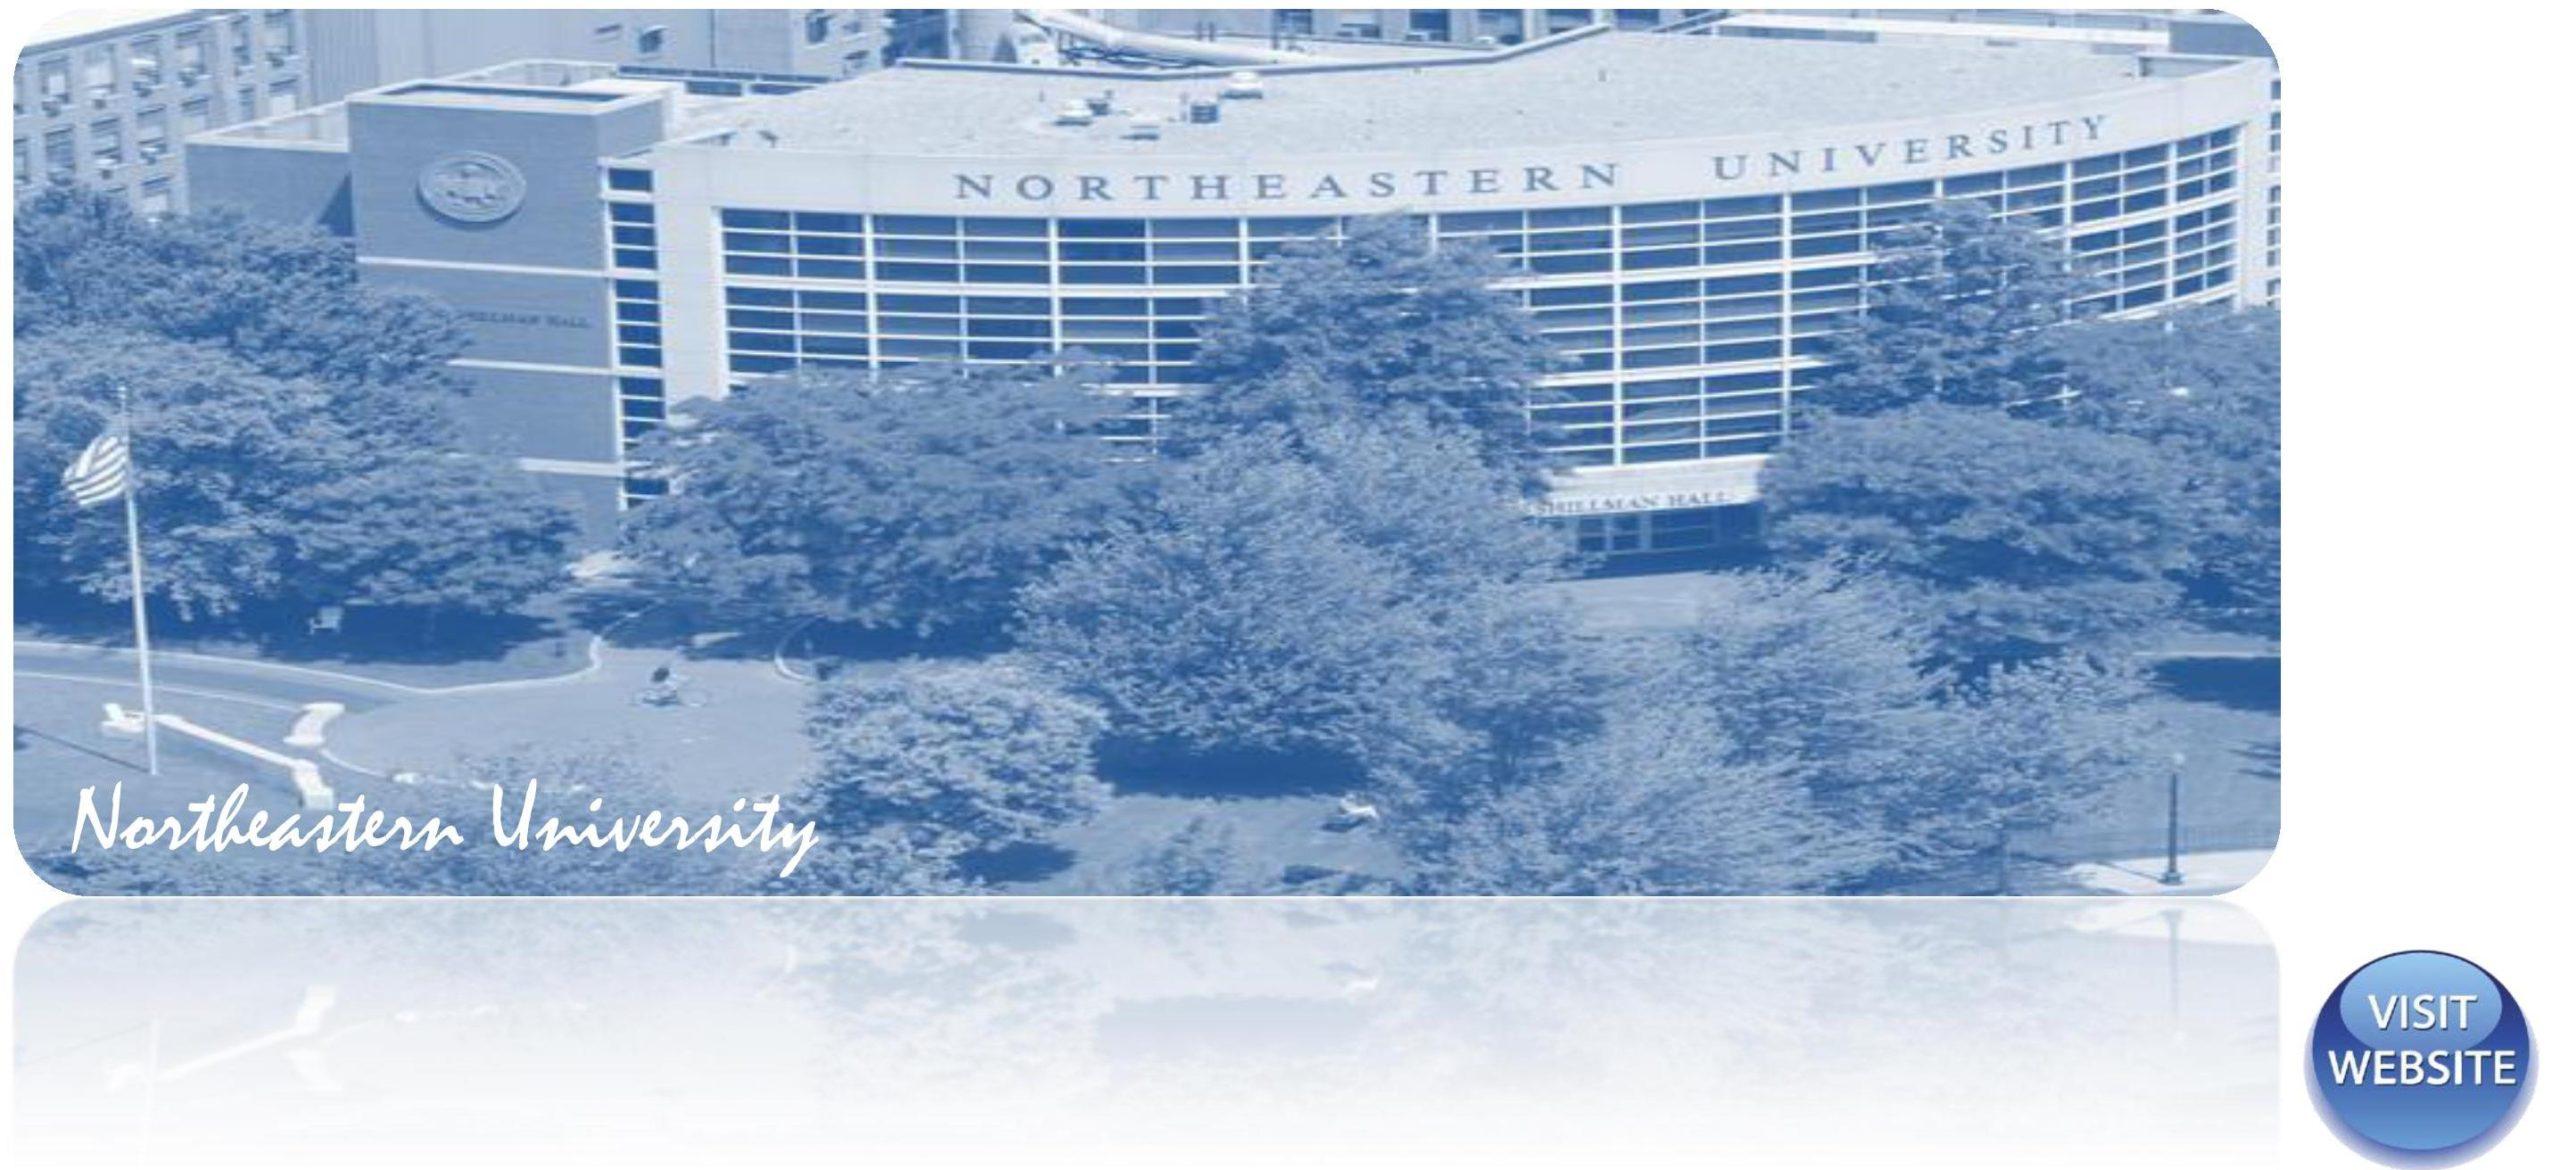 Northeastern University USA